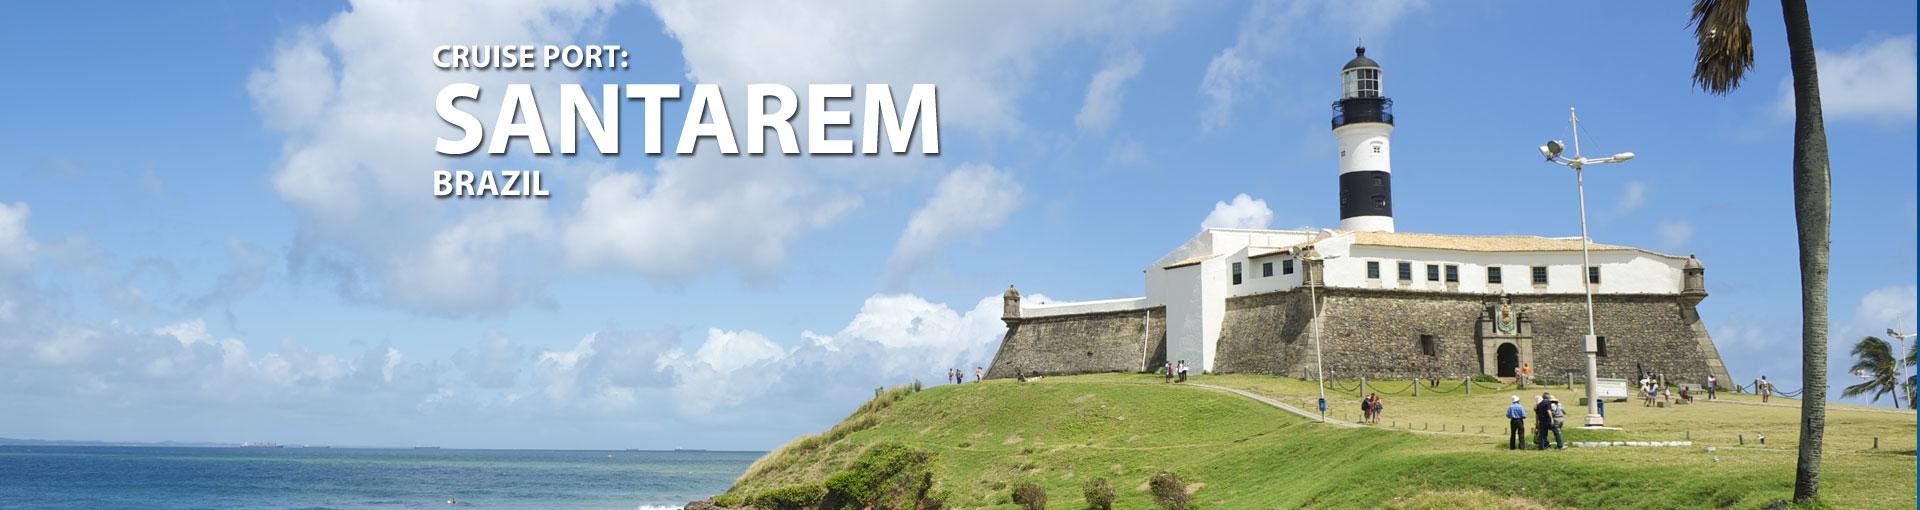 Cruises to Santarem, Brazil